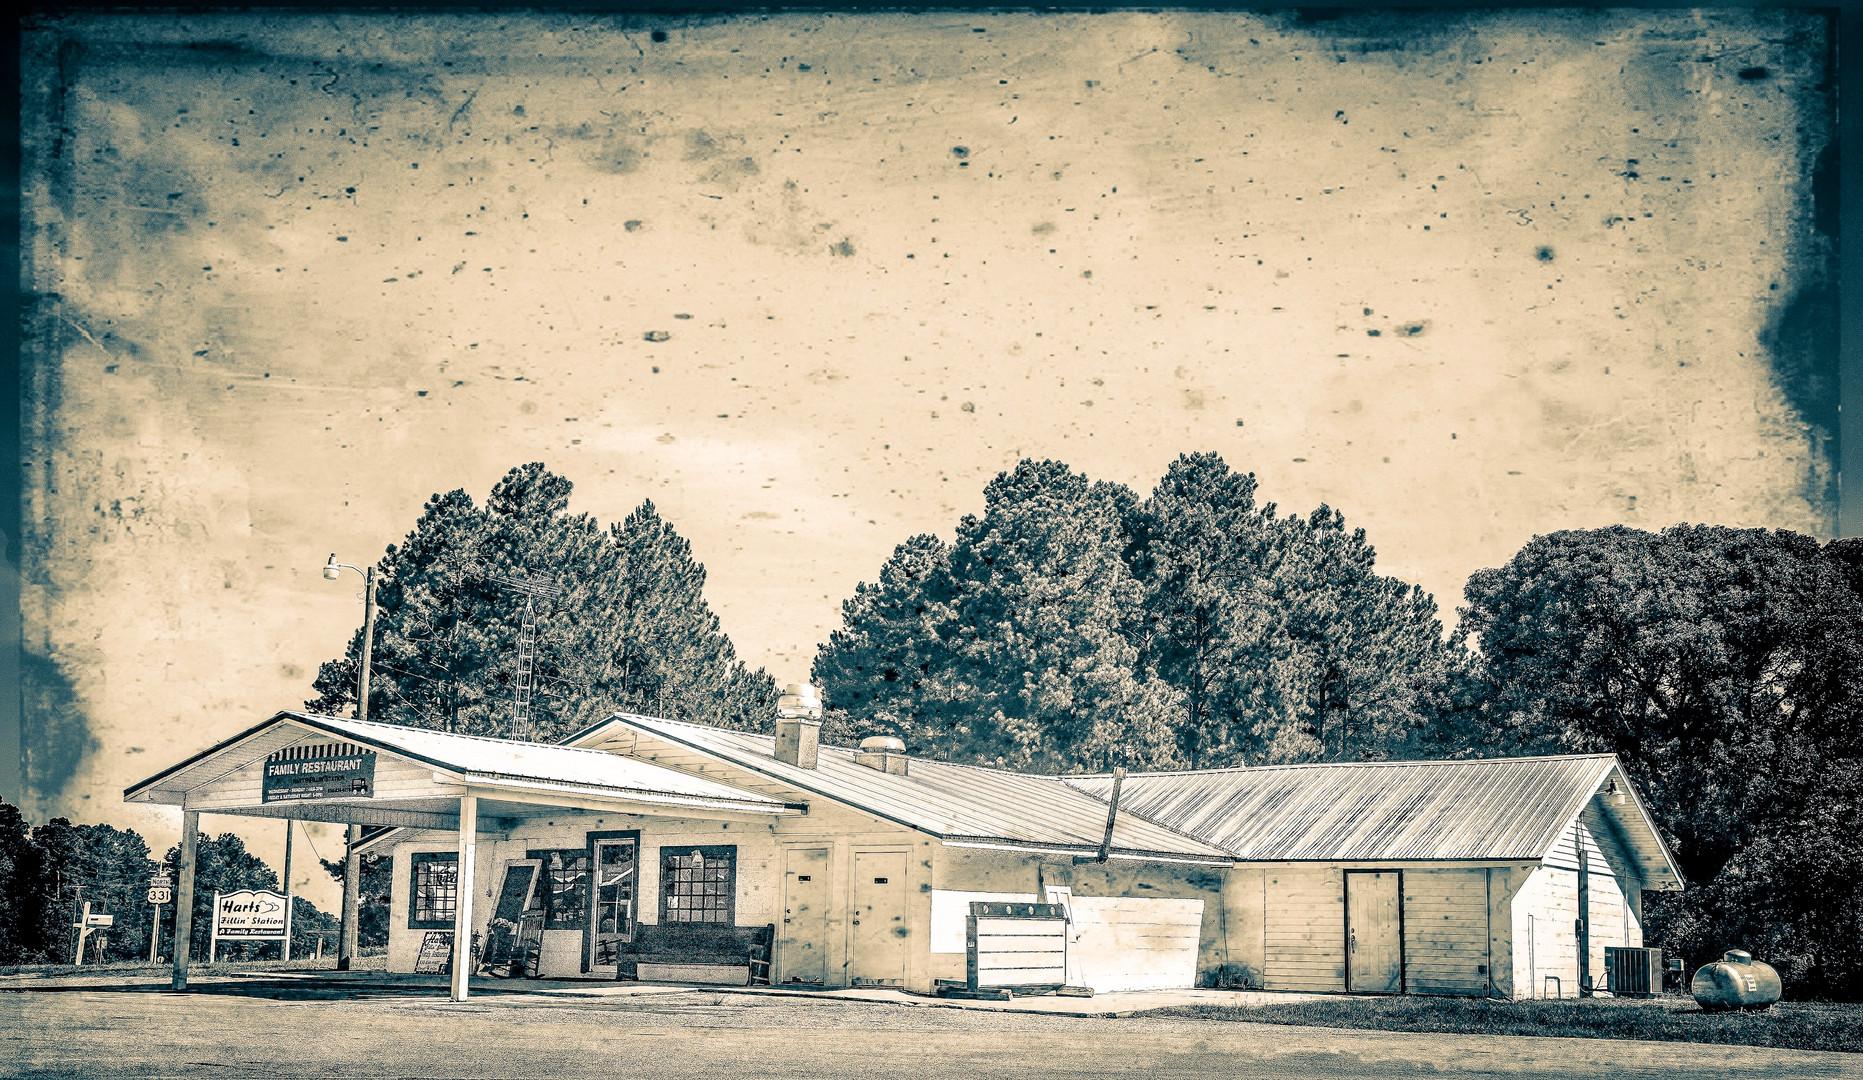 Hart's Fillin' Station